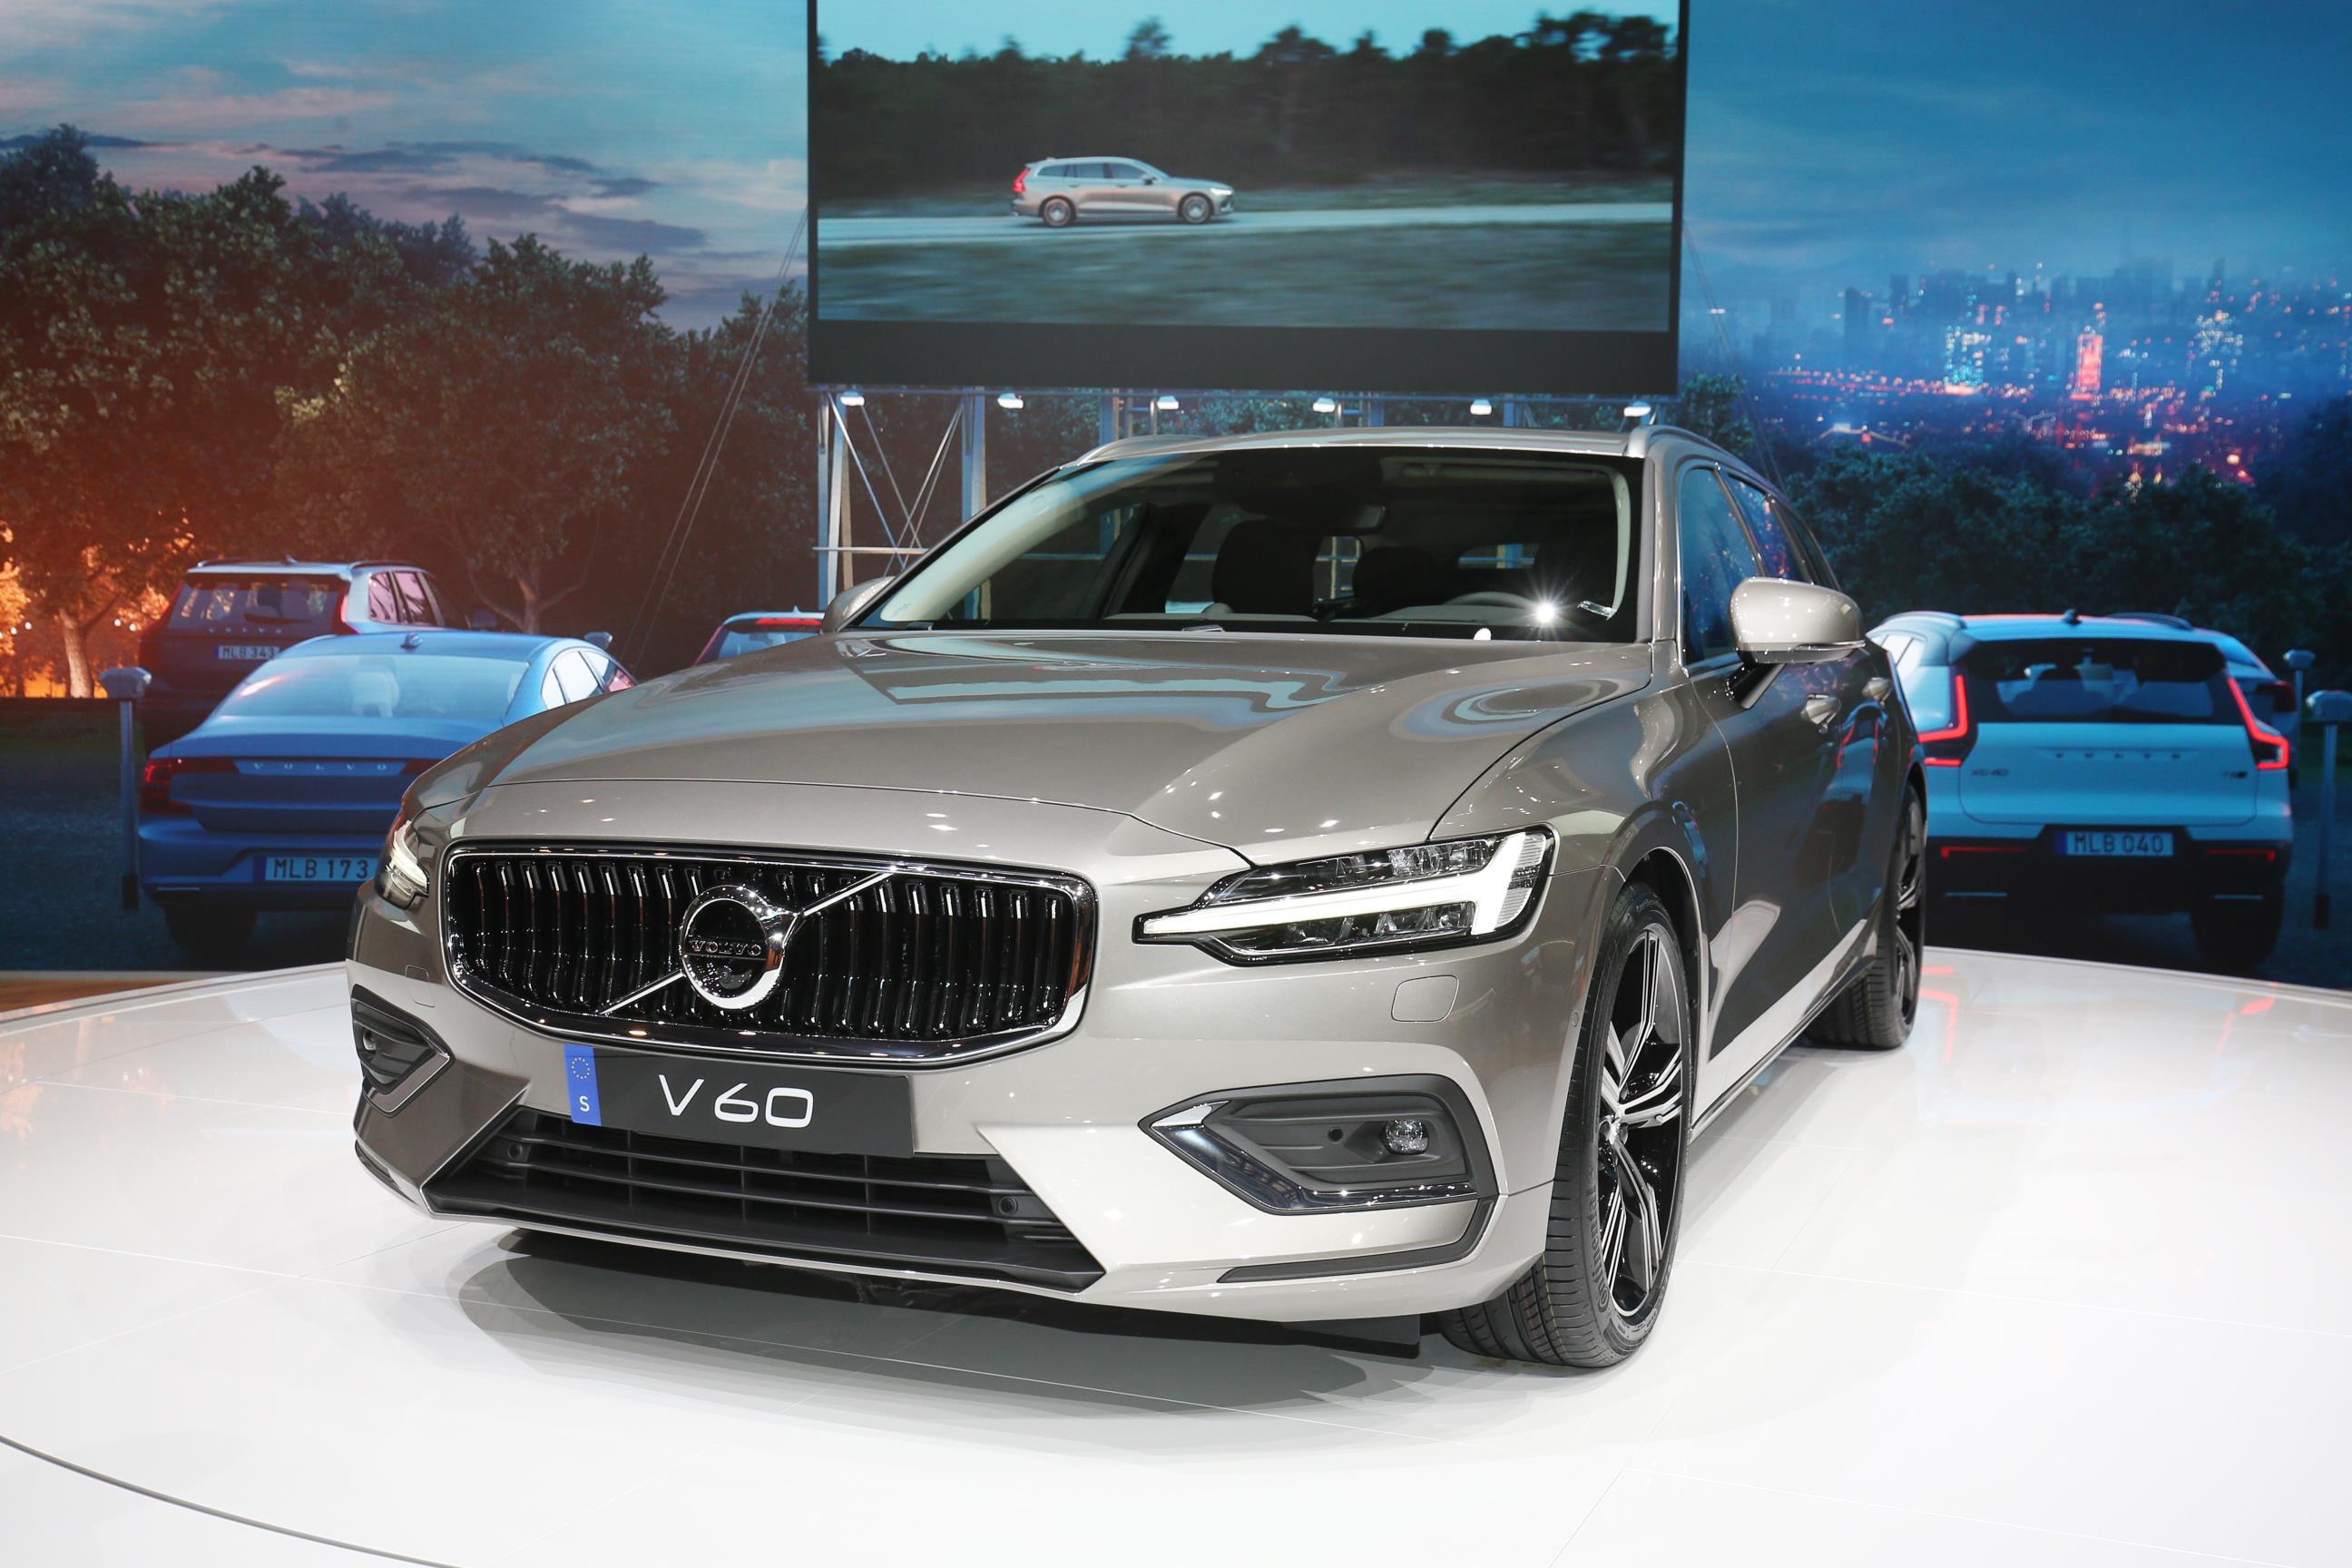 Geneva Motor Show 2018 Mega Gallery Part 2 (311)